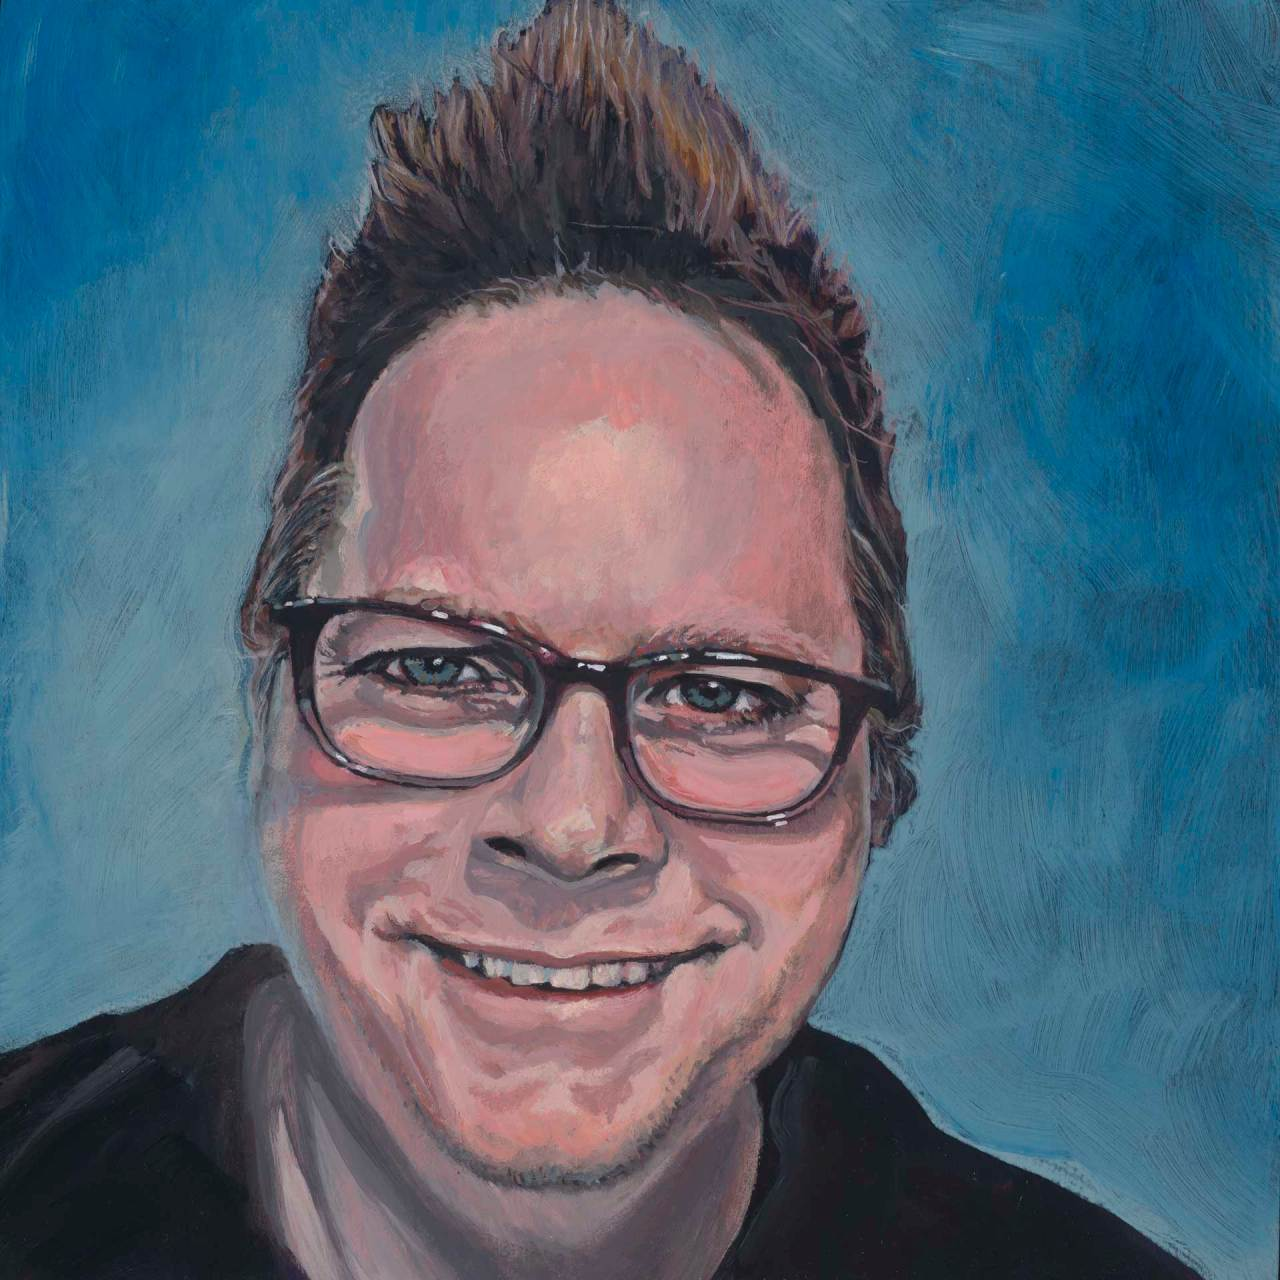 Self portrait of the artist.